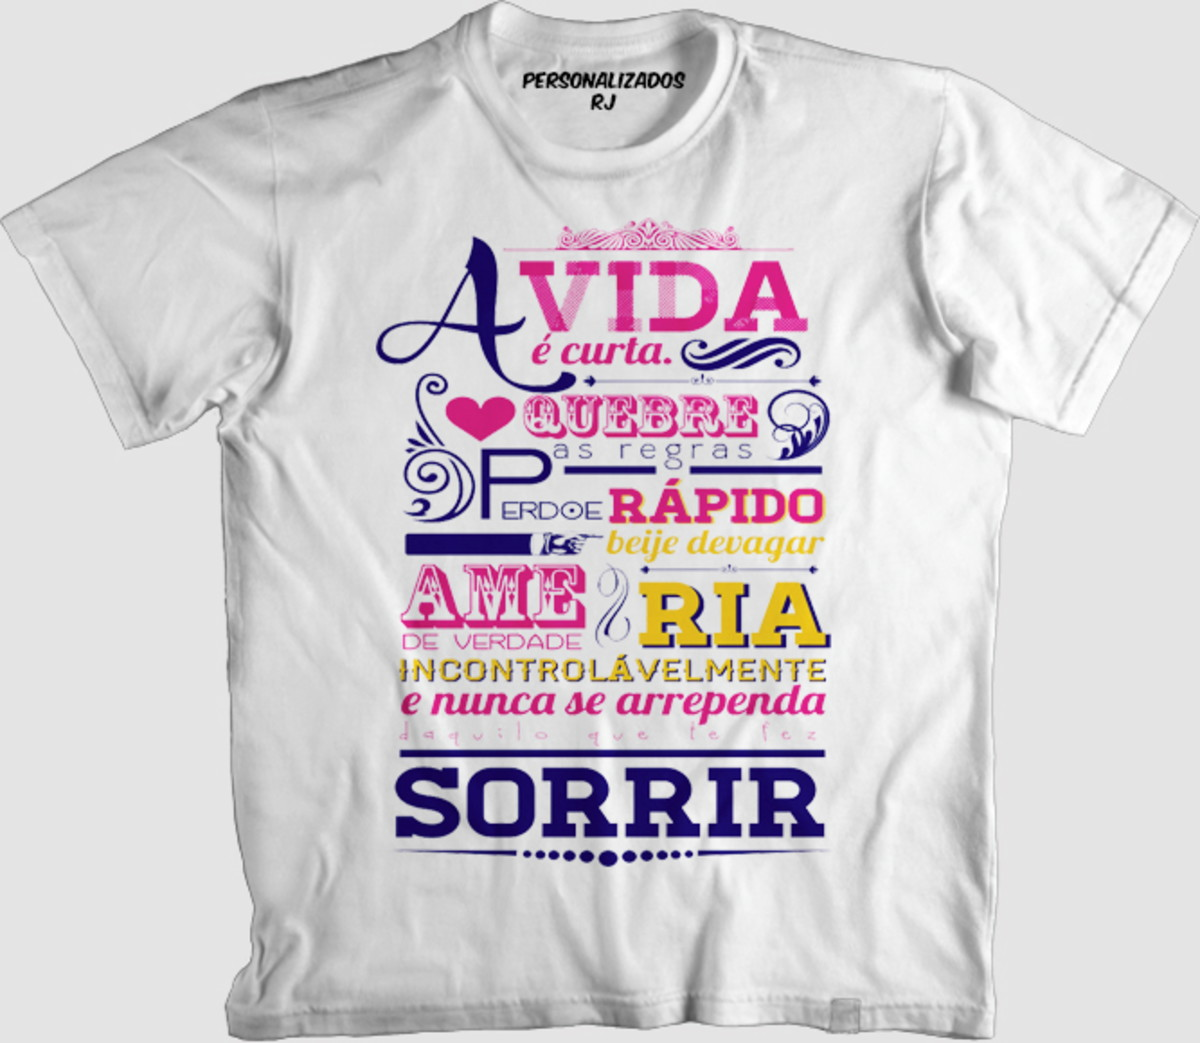 fe13fc10a21a Camisa A VIDA É CURTA